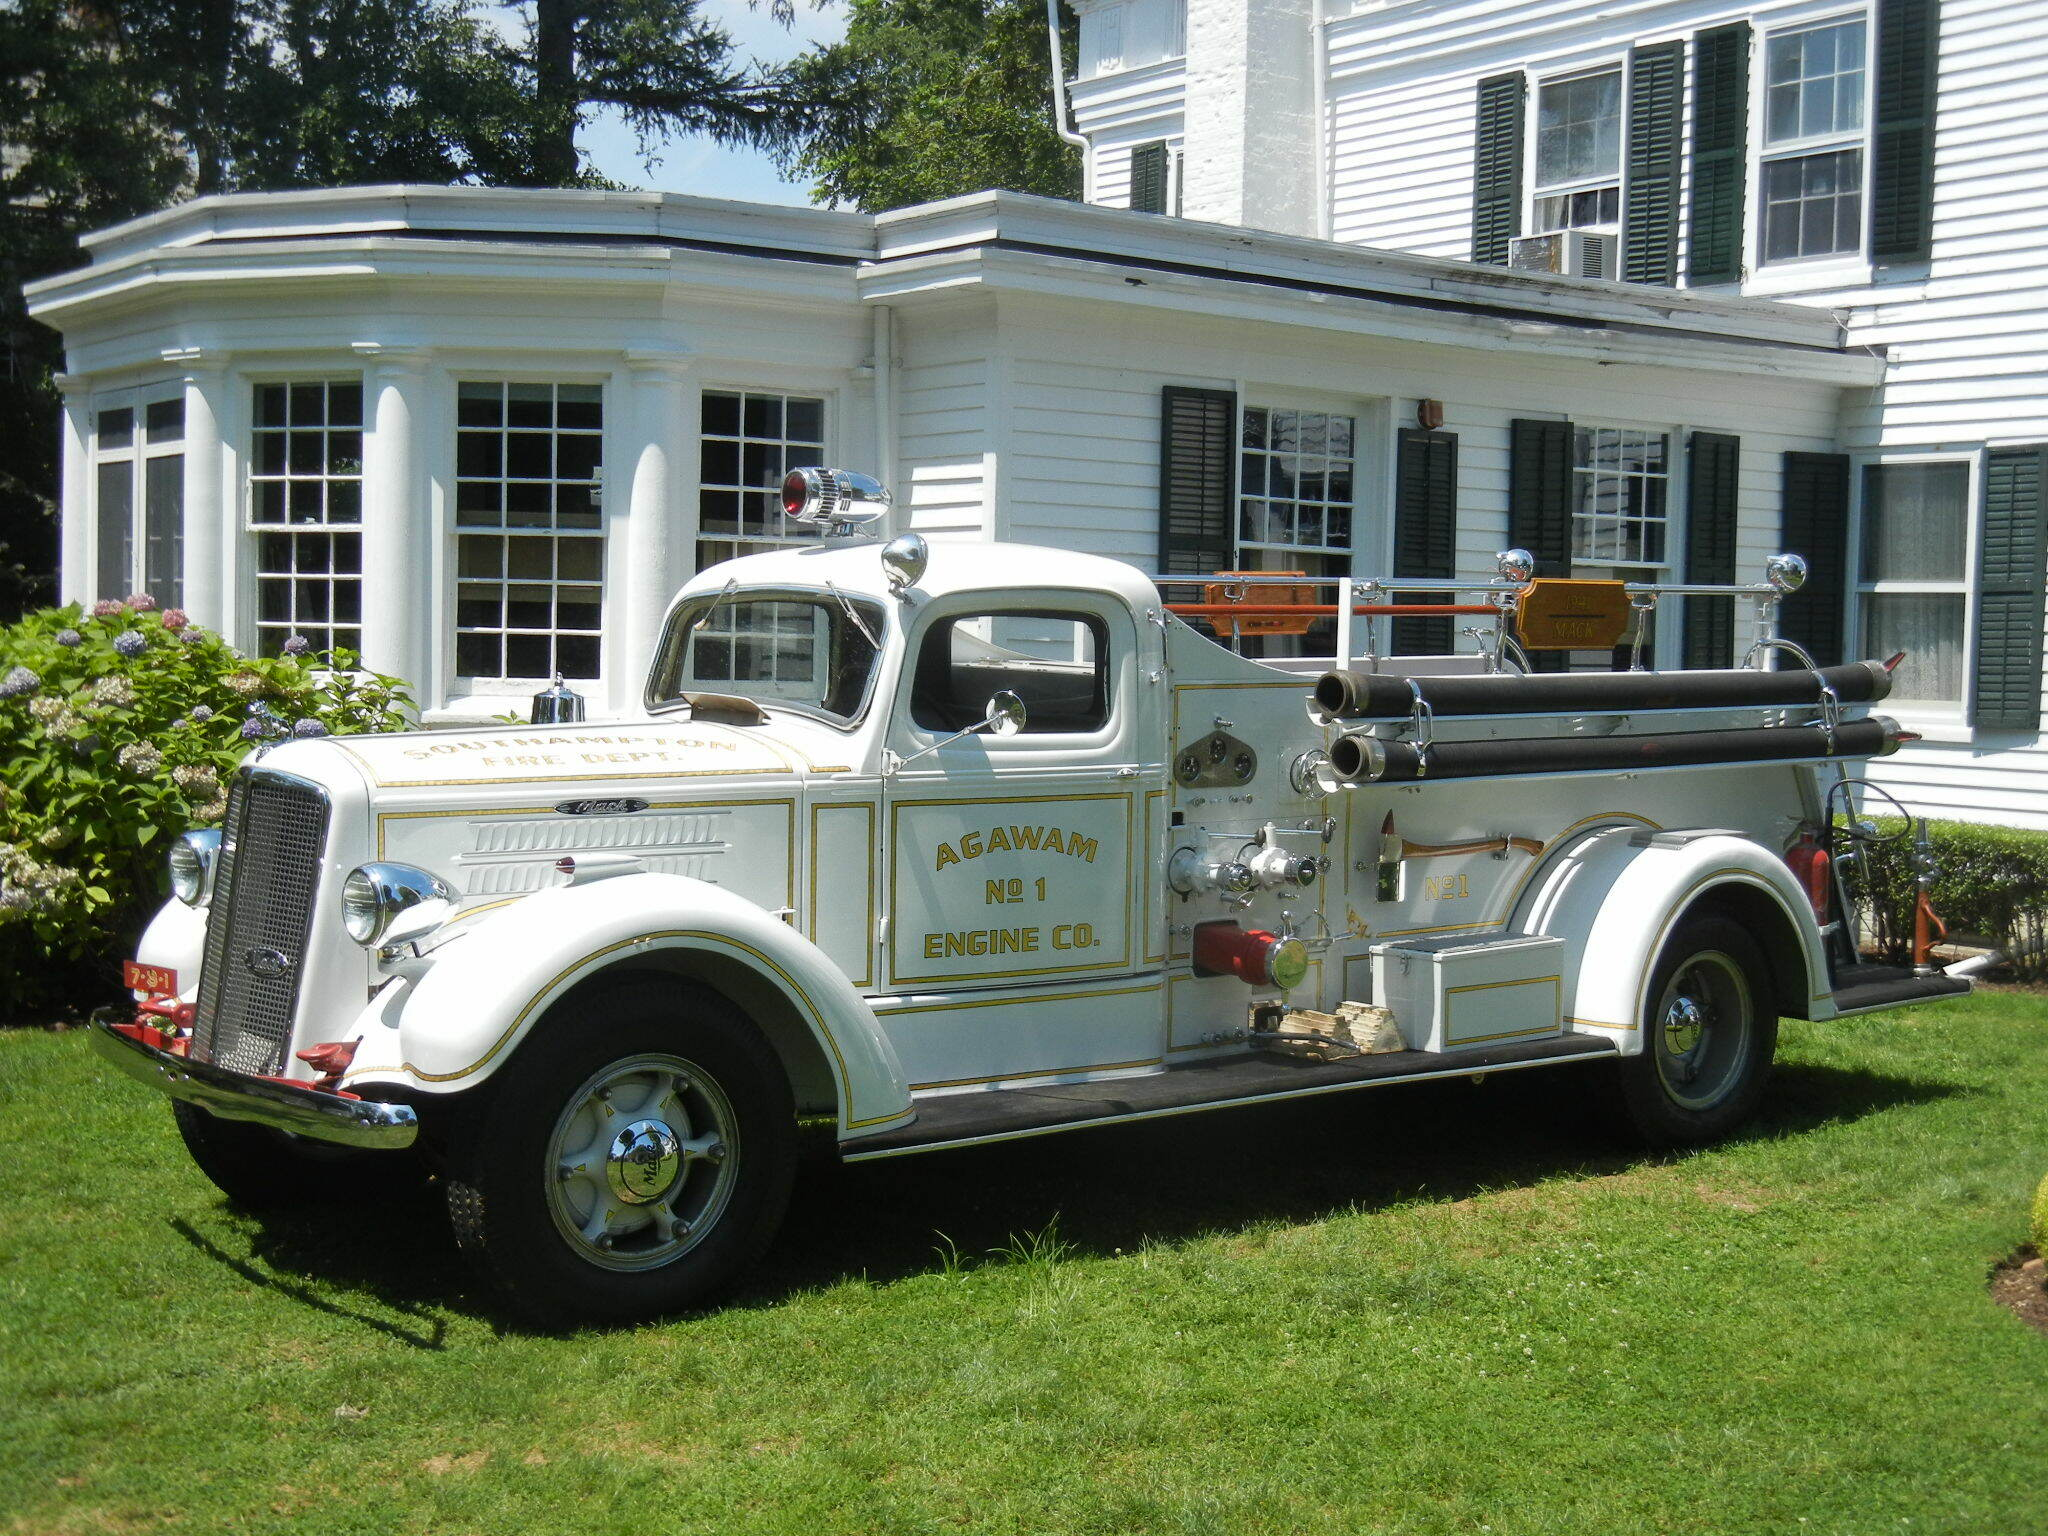 Fire Truck No. 1 Agawam Engine Co. 1912